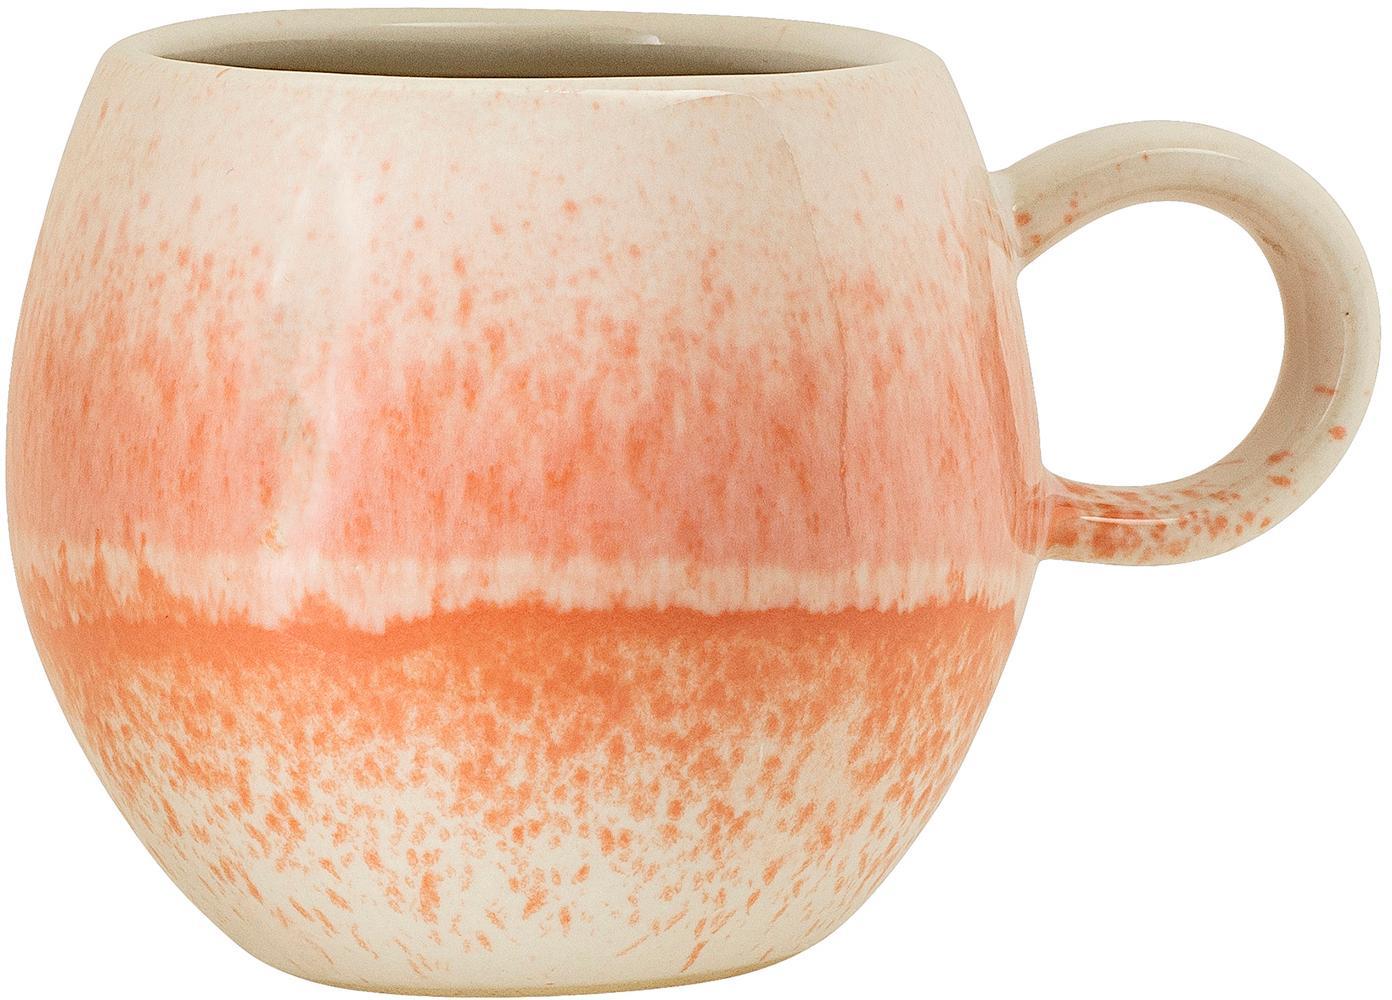 Taza artesanal Paula, Gres, Naranja, crema, Ø 9 x Al 8 cm